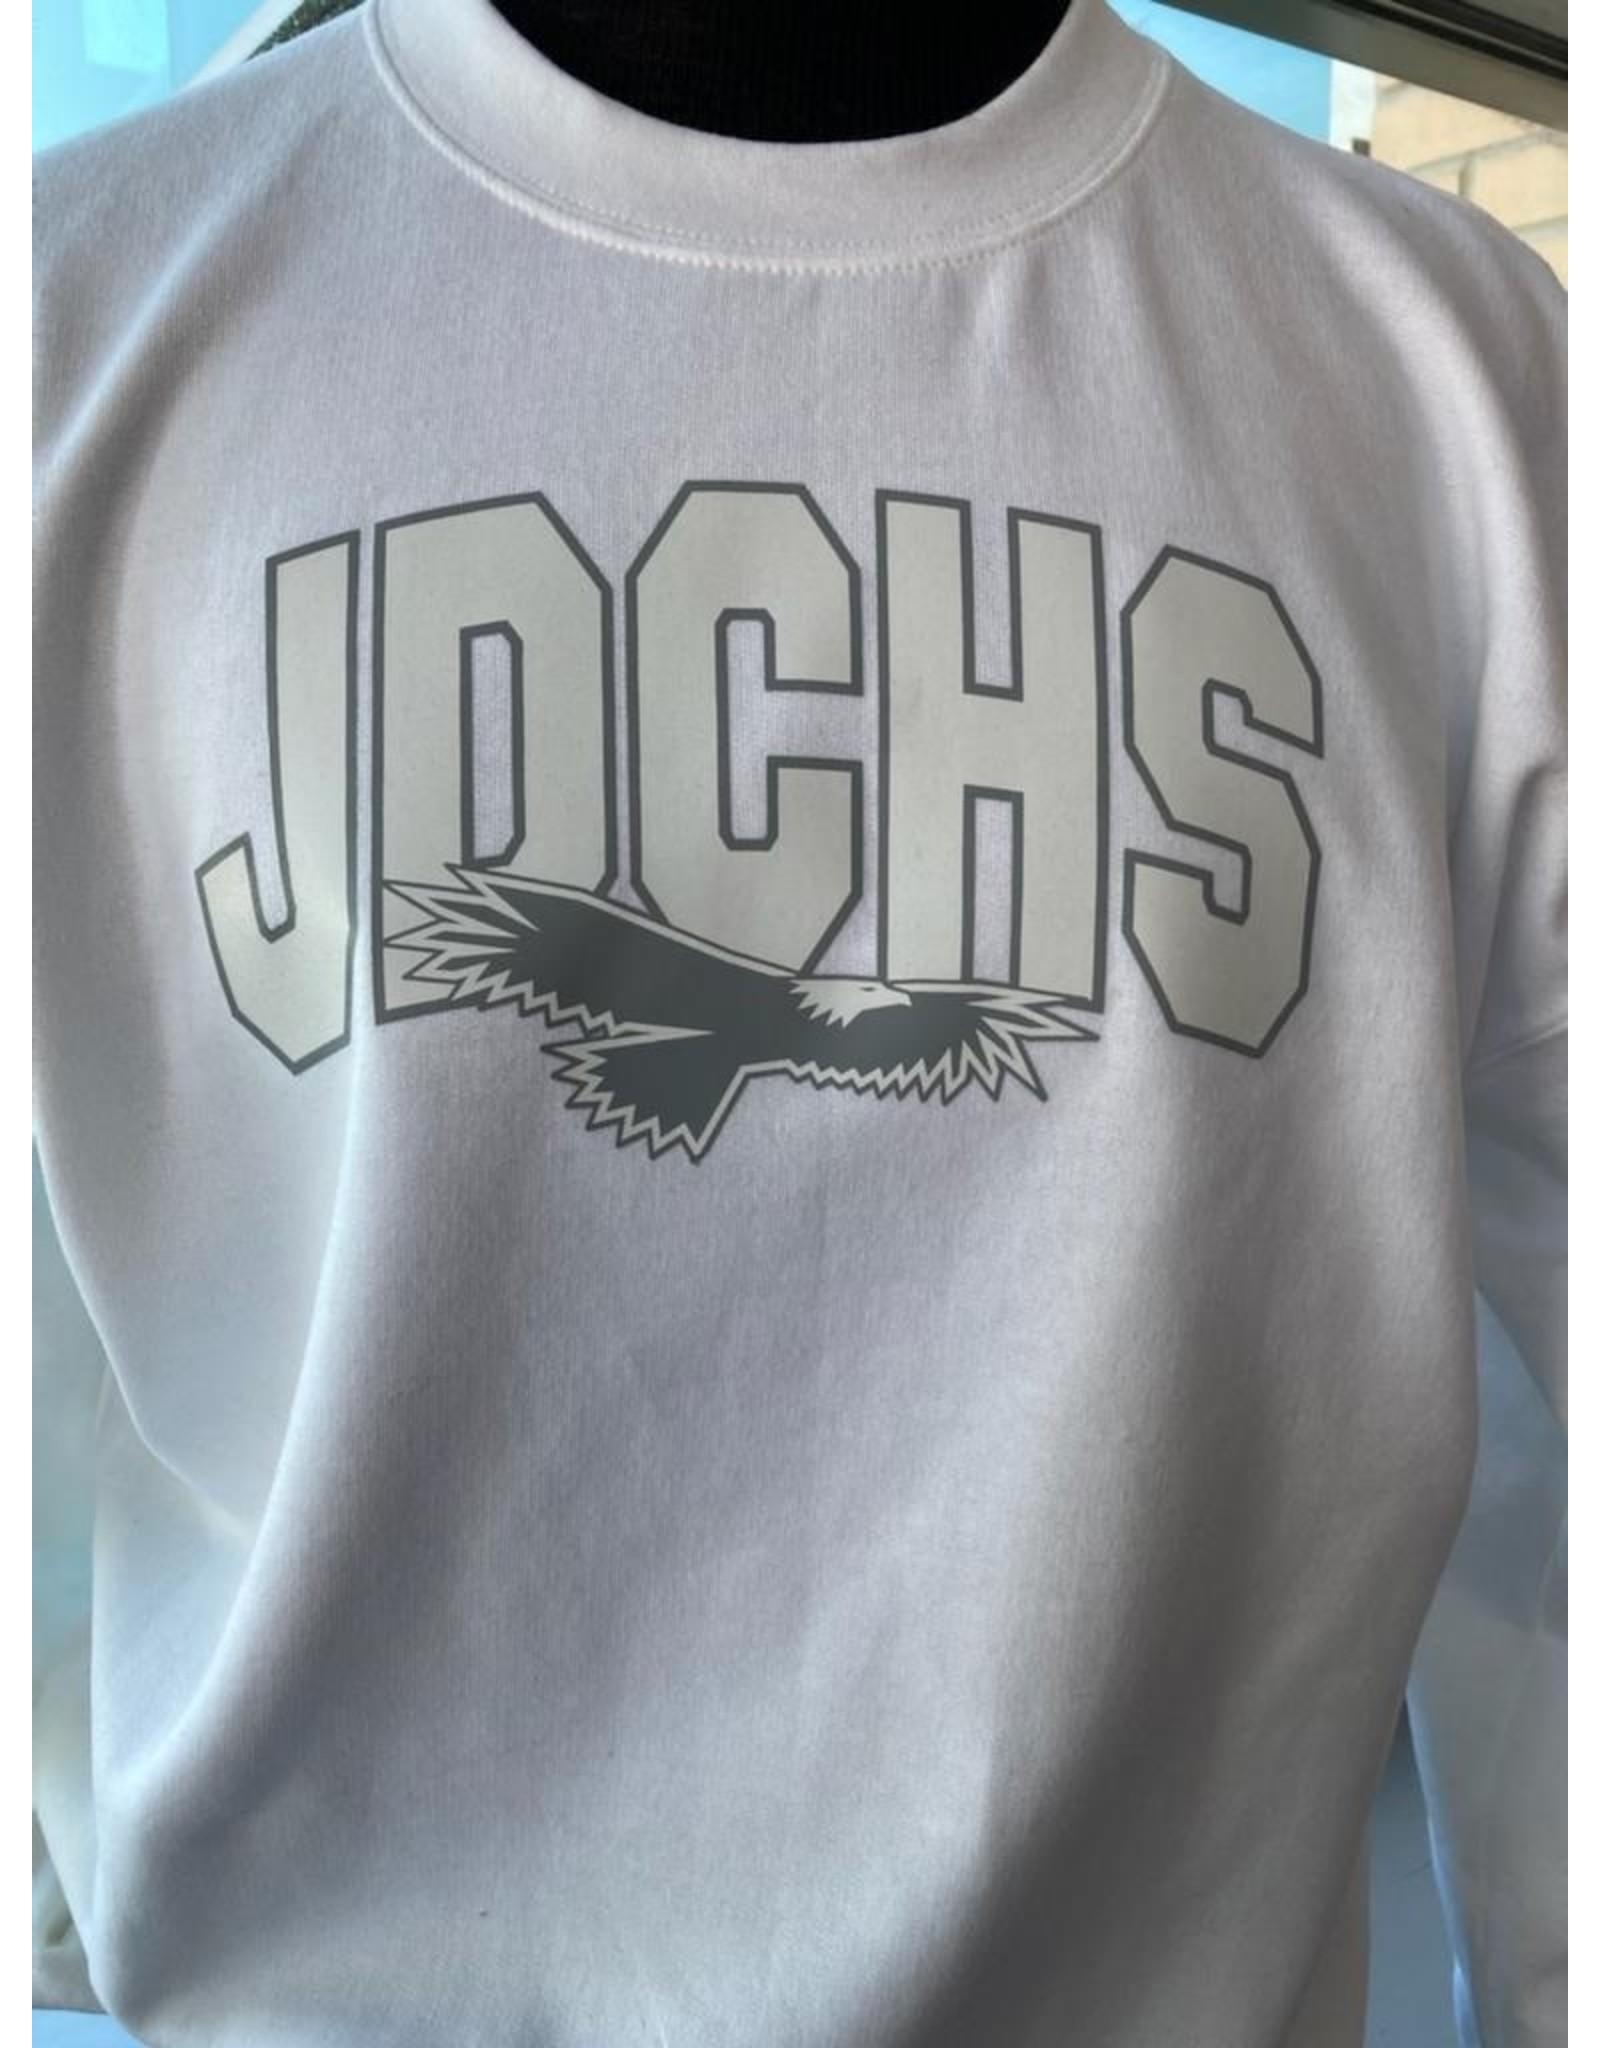 NON-UNIFORM SWEATSHIRT - JDCHS Eagle Crew Neck, Unisex